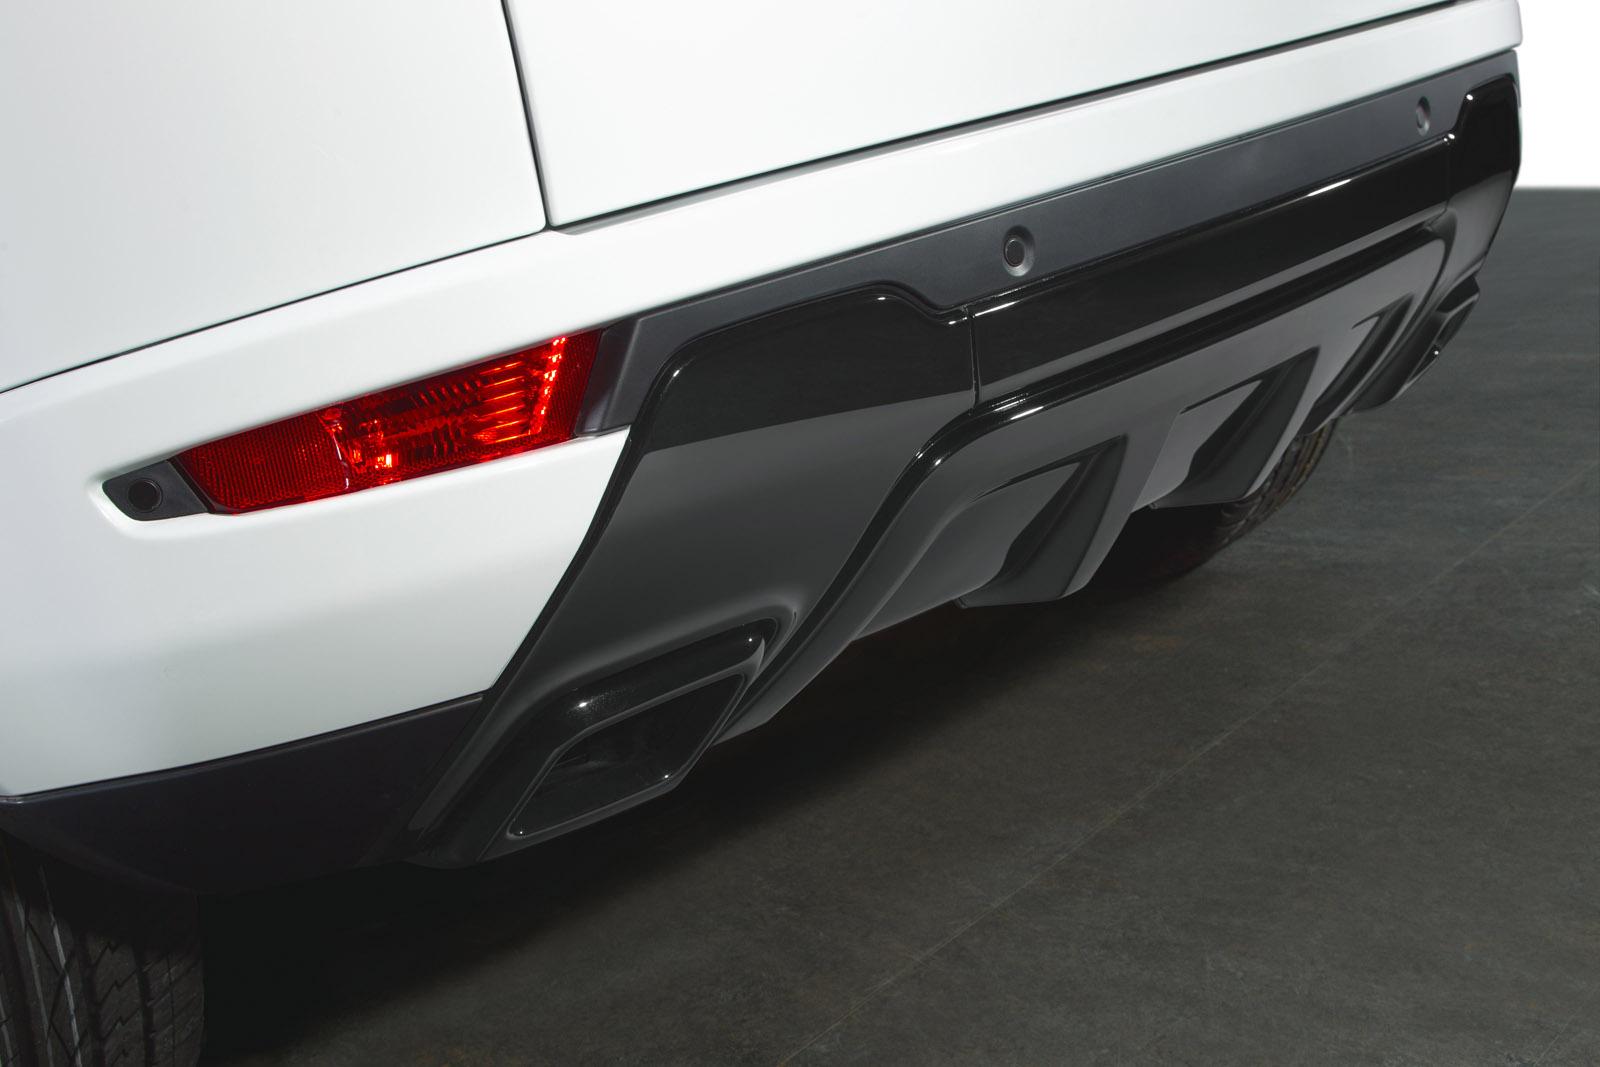 Range Rover Evoque Black Design Pack